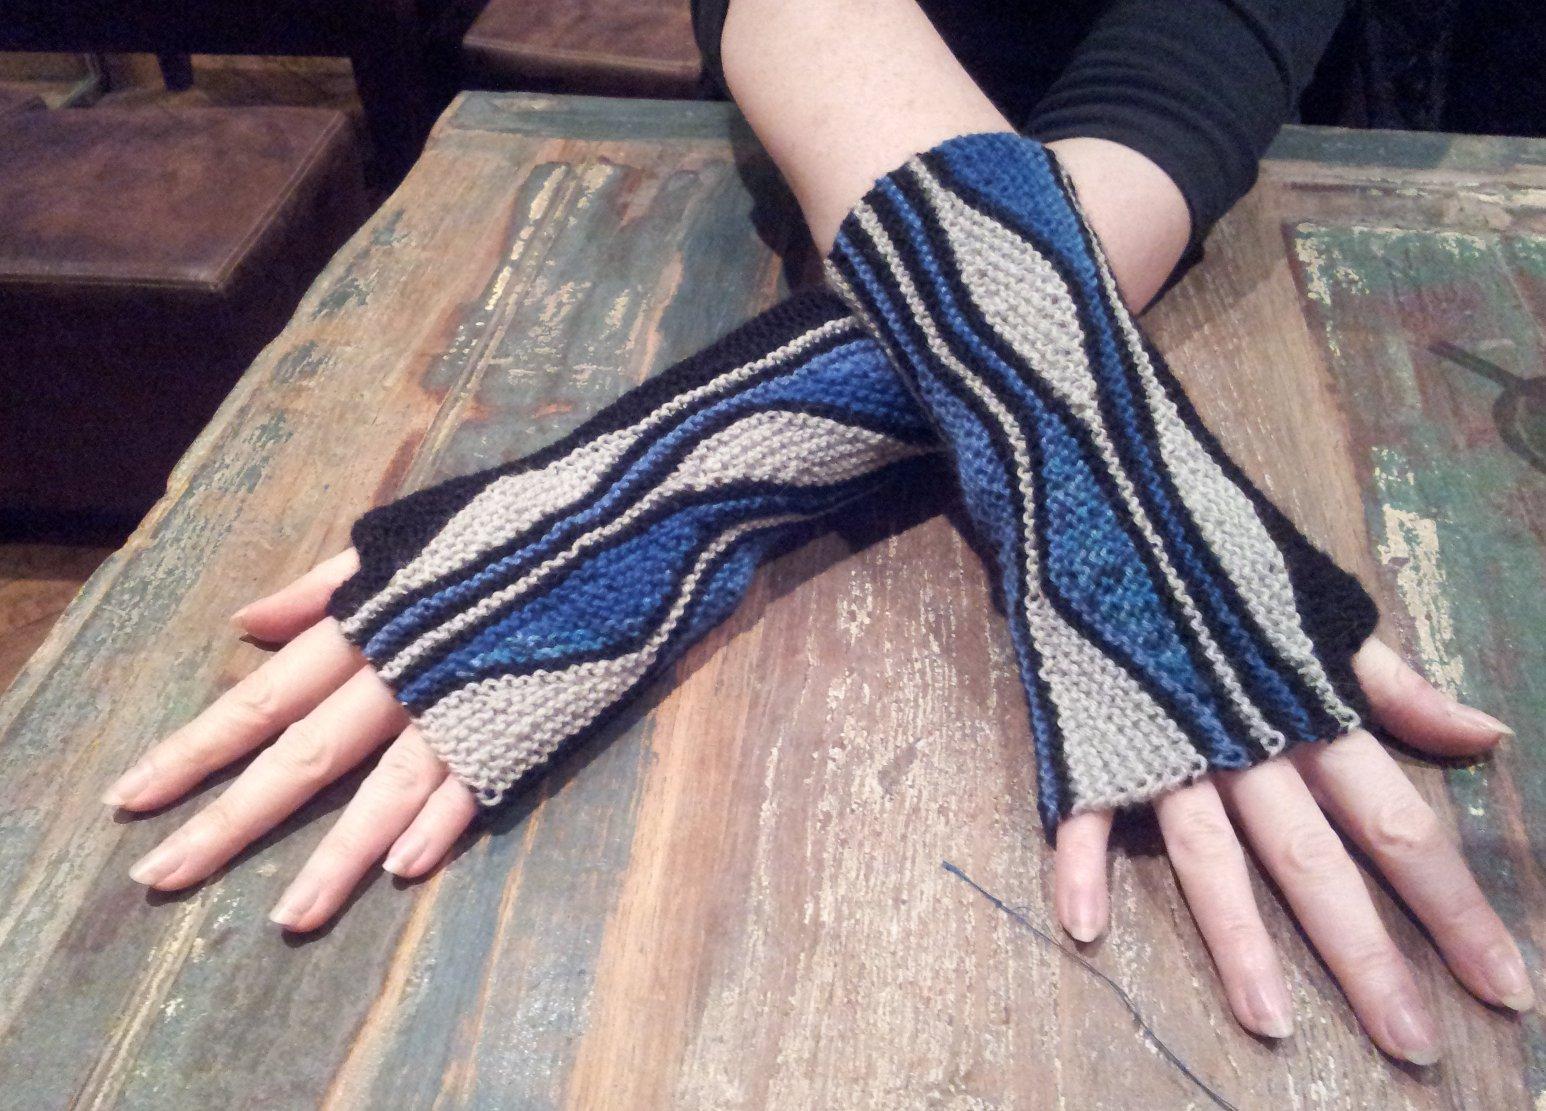 вязание спицами клуб на осинки со схемами шали